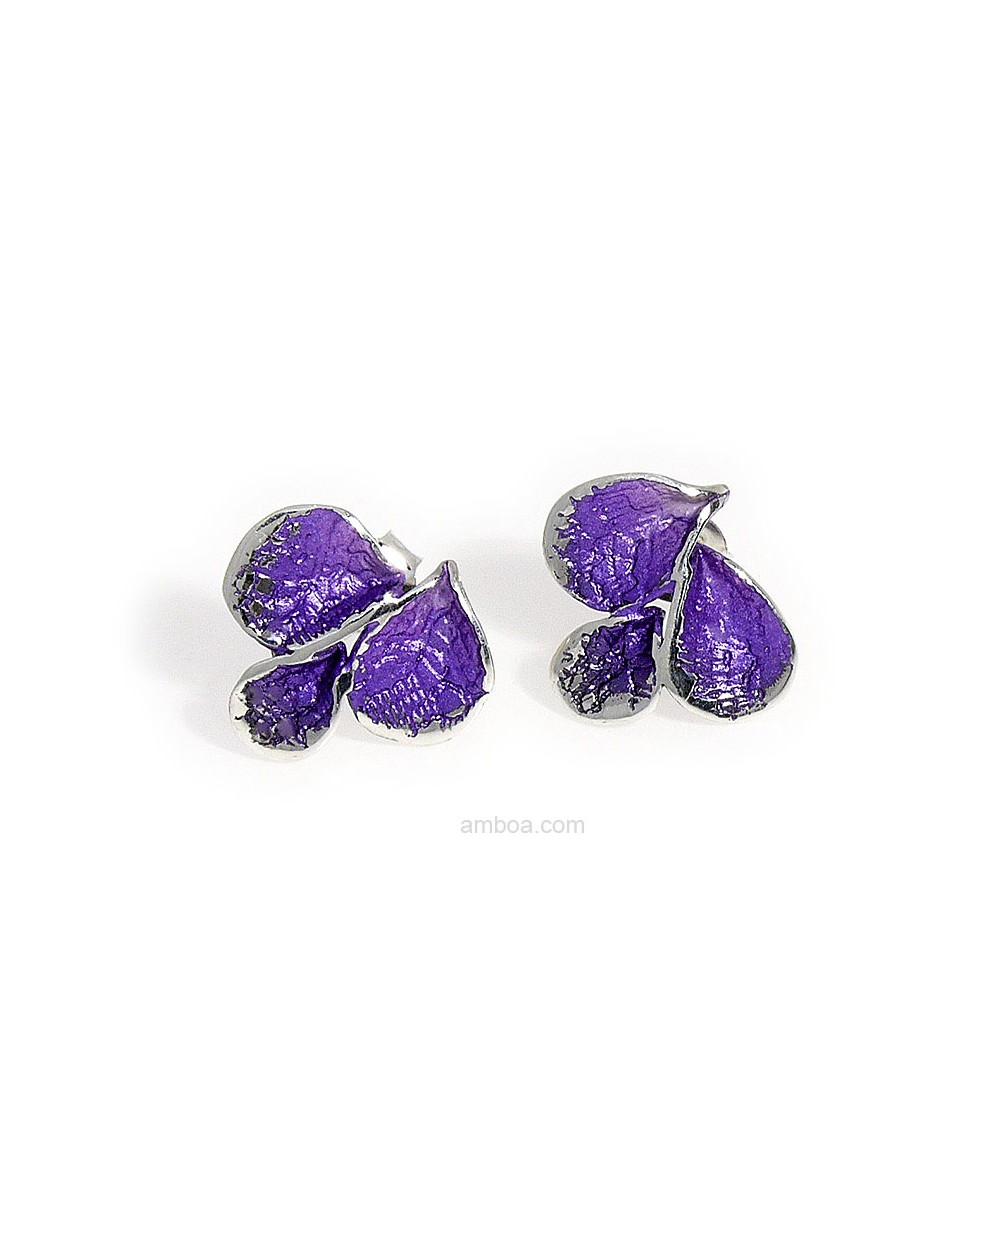 Pendientes Petalos presion pequeños orfega plata violeta